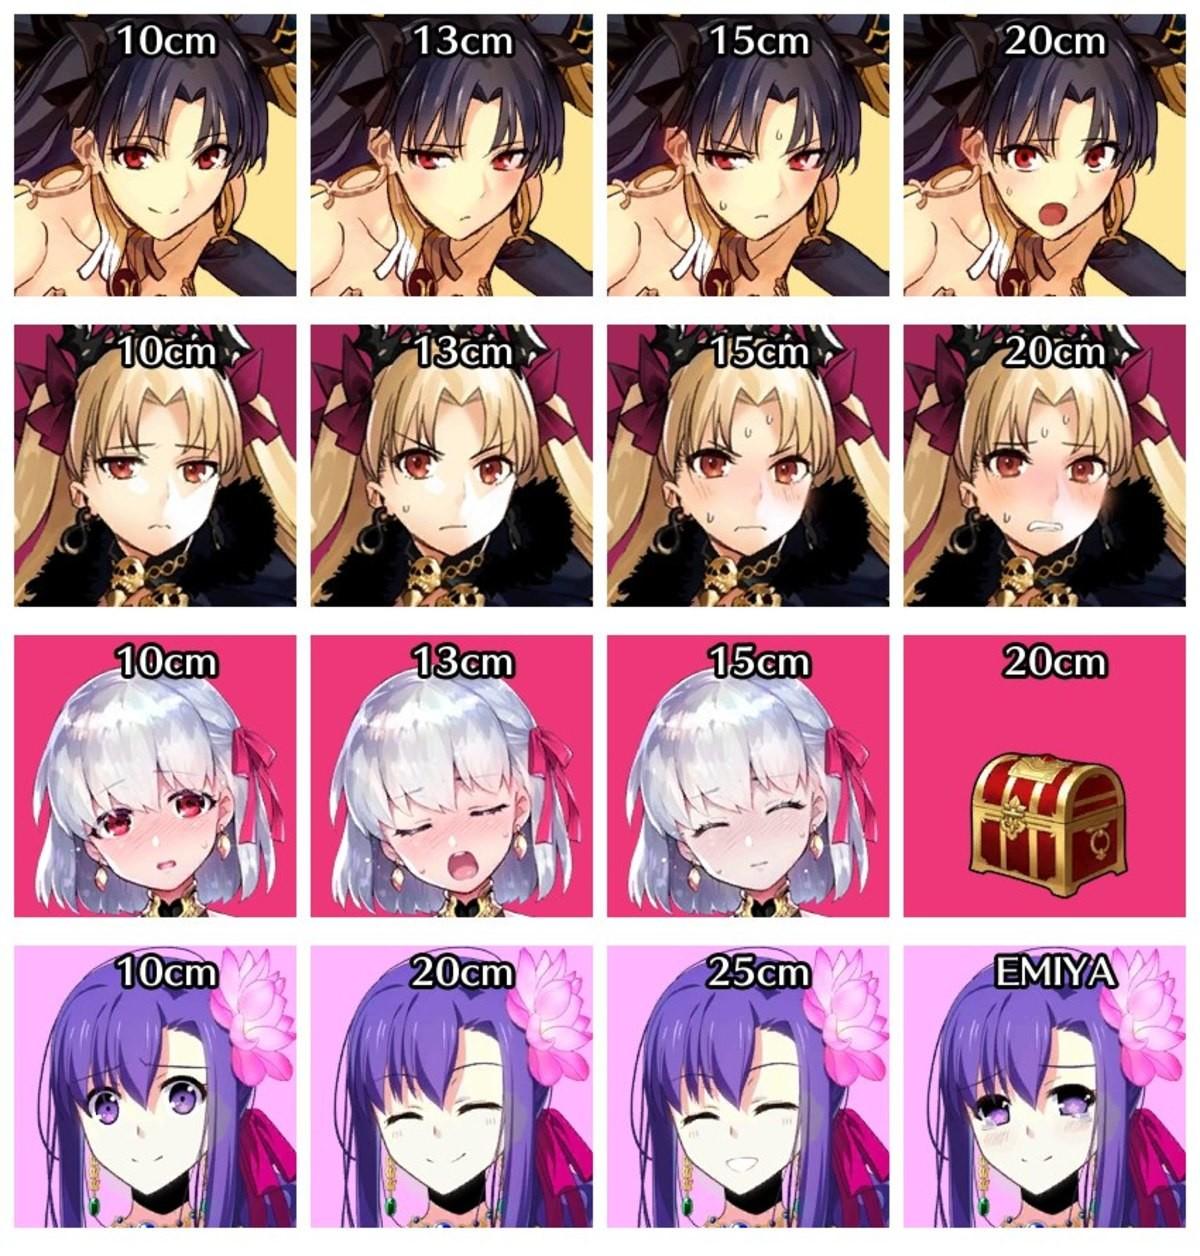 The Length. .. I'm guessing top 2 are Tohsaka and bottom 2 are Sakura?